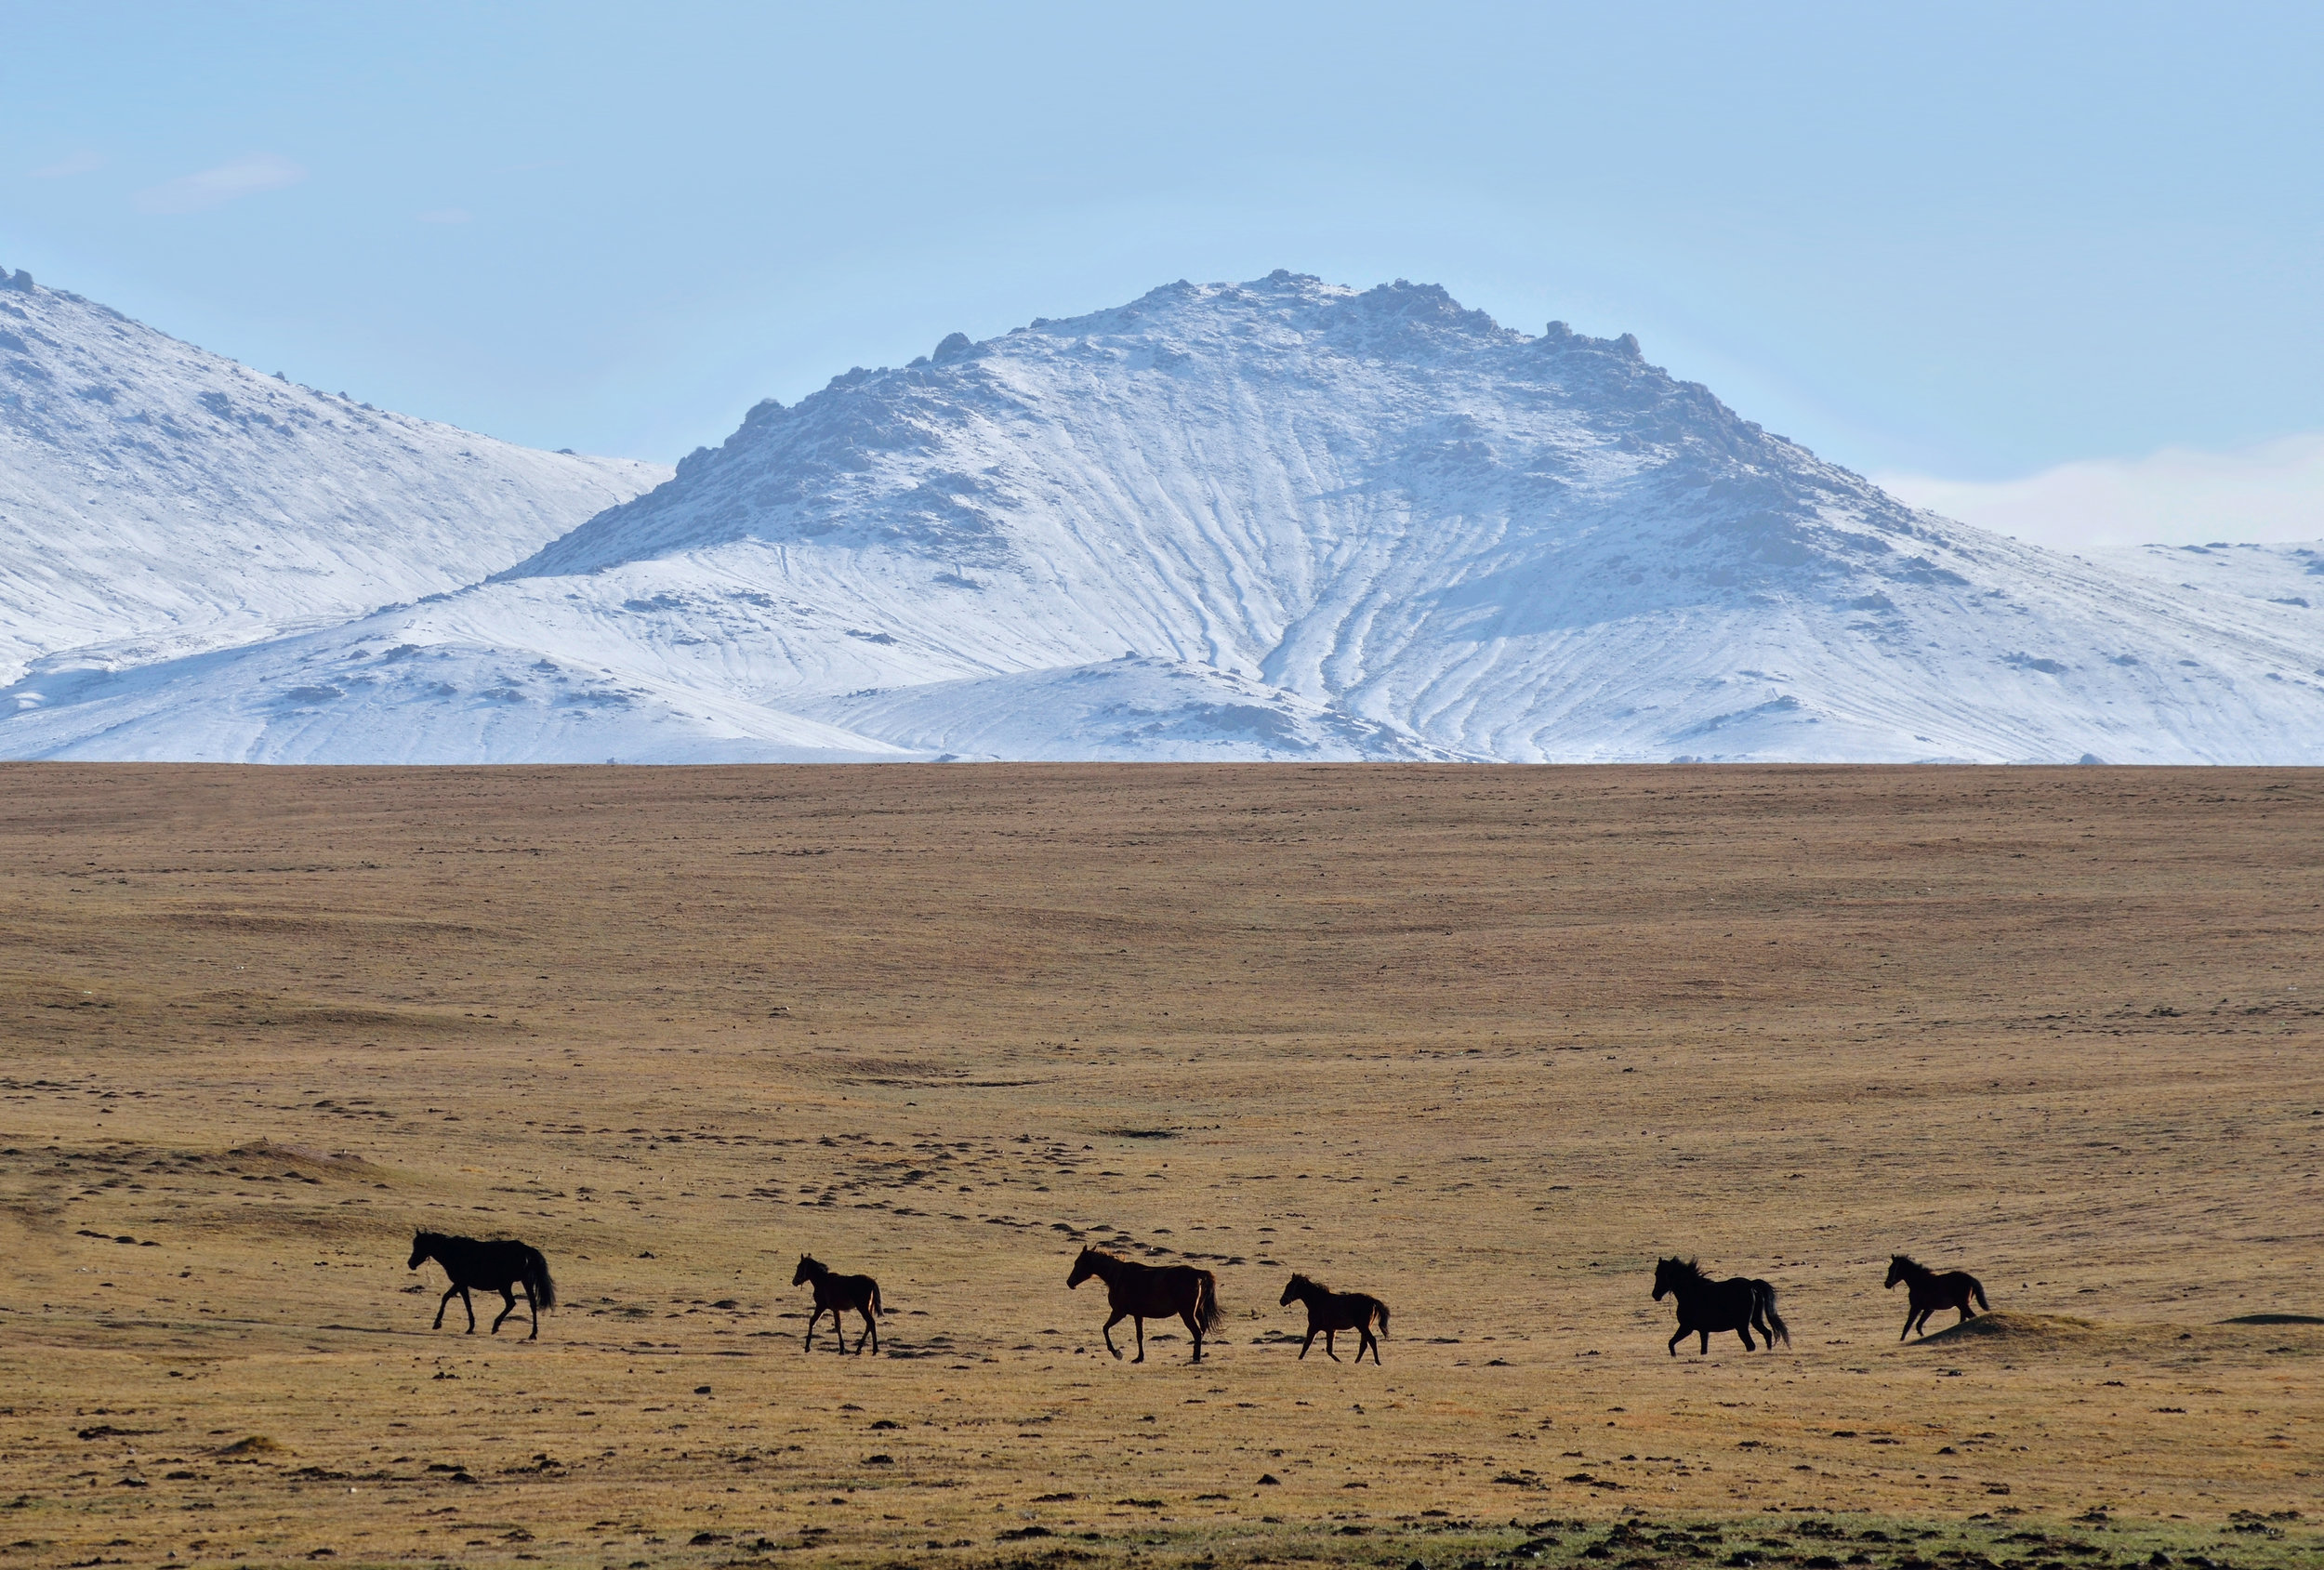 kygyzstan_son-kul-lake-bigstock-Herd-Of-Horses-Near-Son-kul-Mo-264435169.jpg